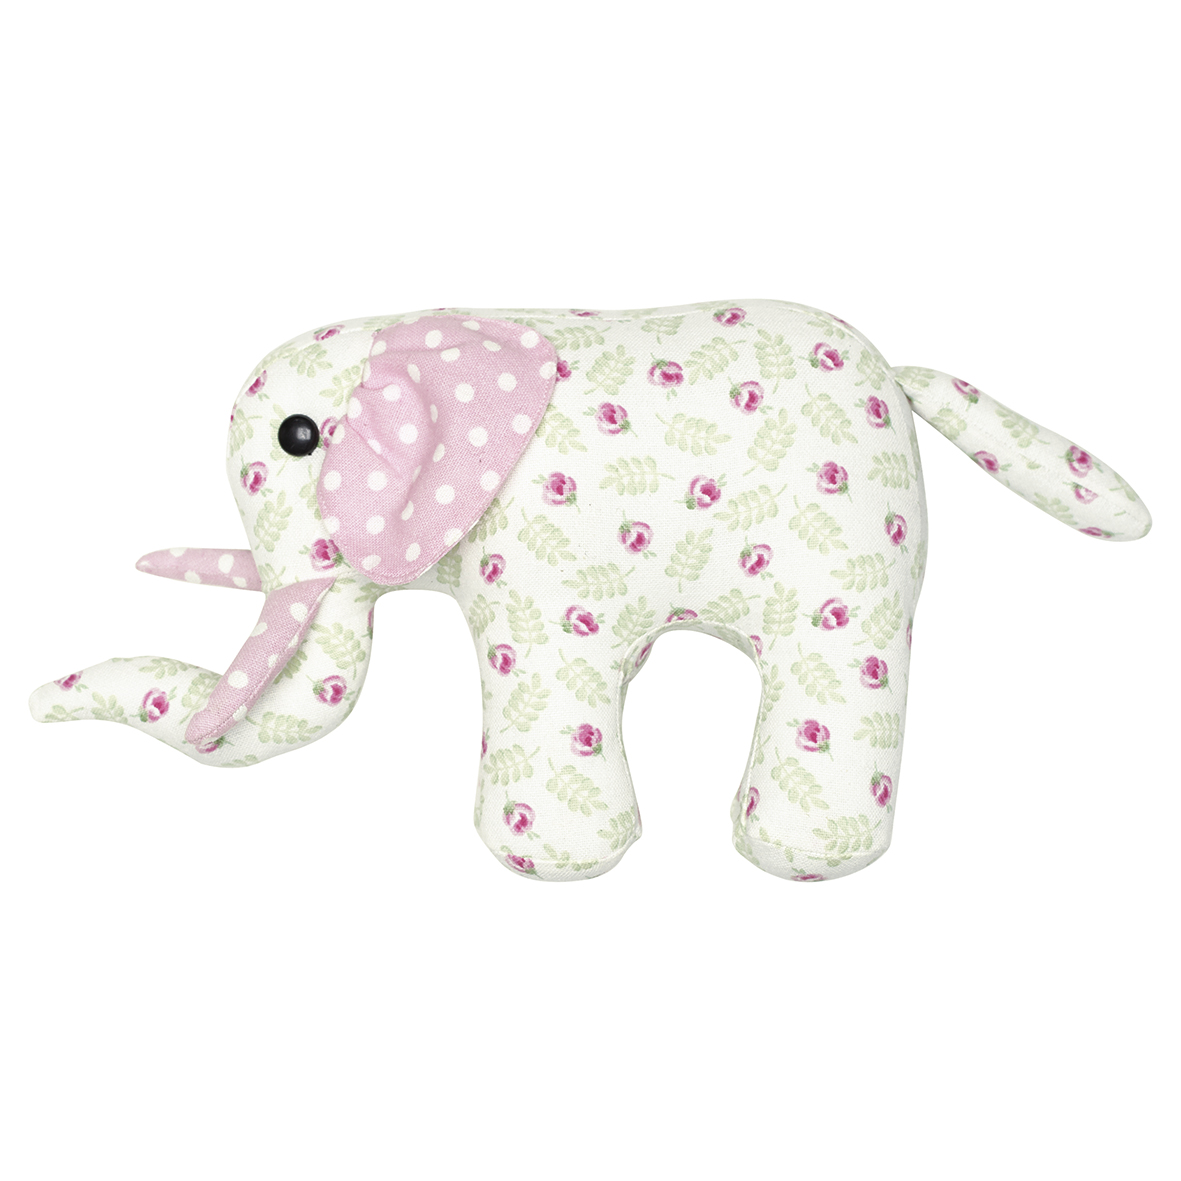 GG Elephant Lily petit white